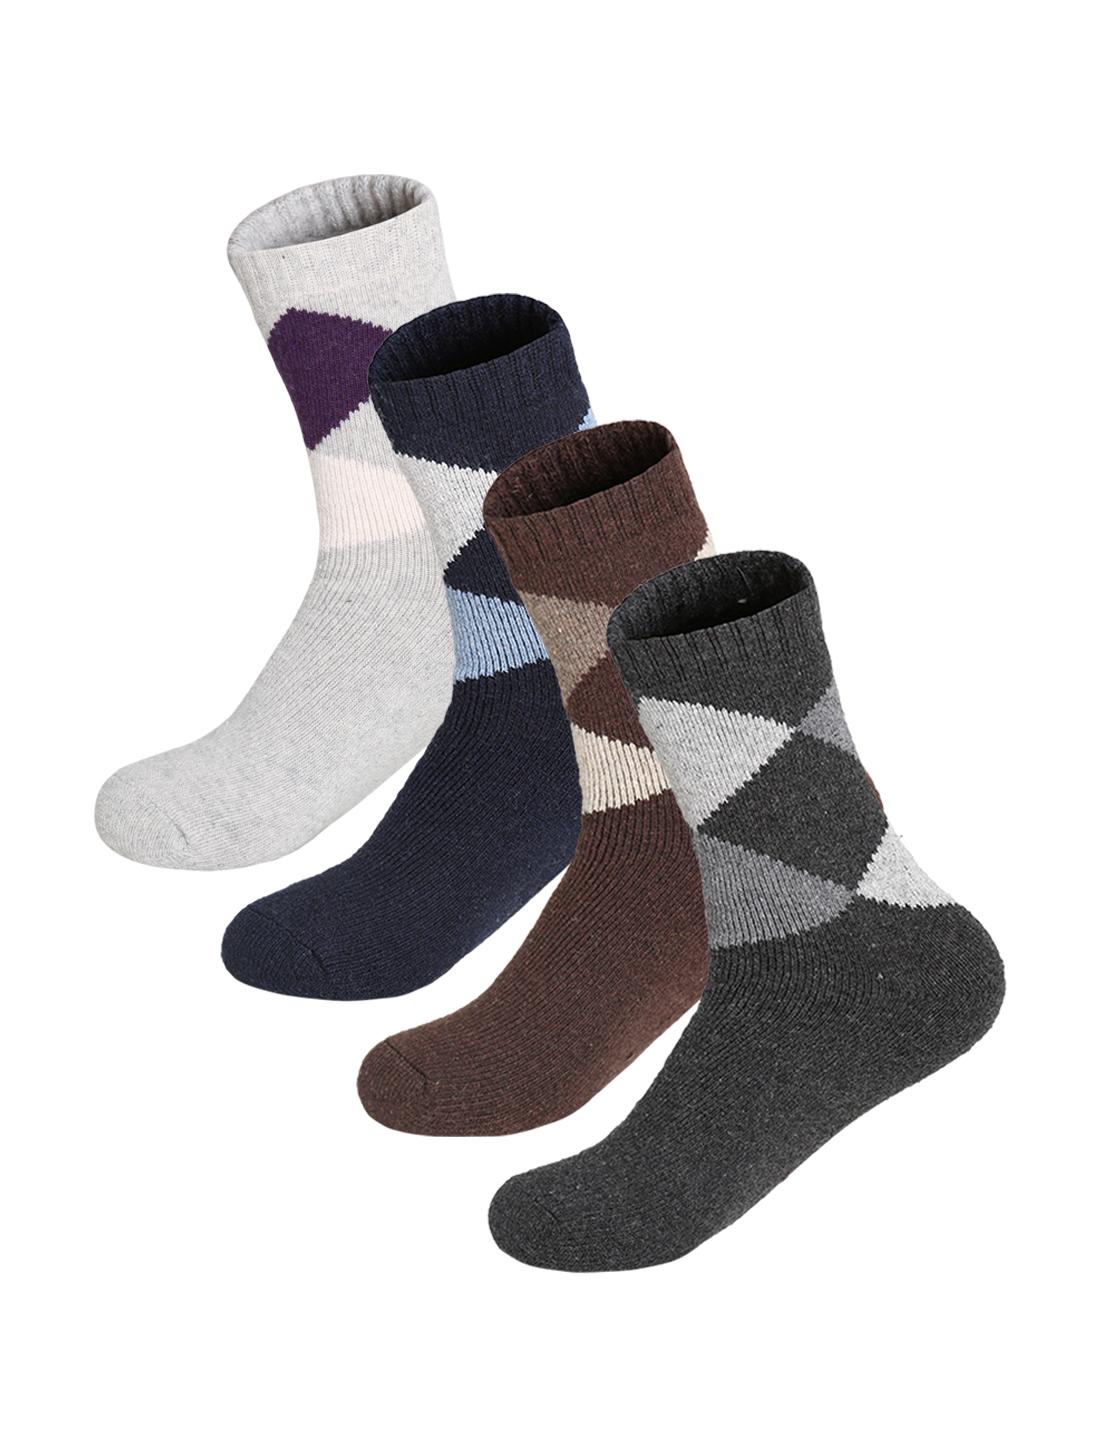 Men 4 Pack Argyle Pattern Thermal Crew Socks 10-12 Assorted-Argyle4